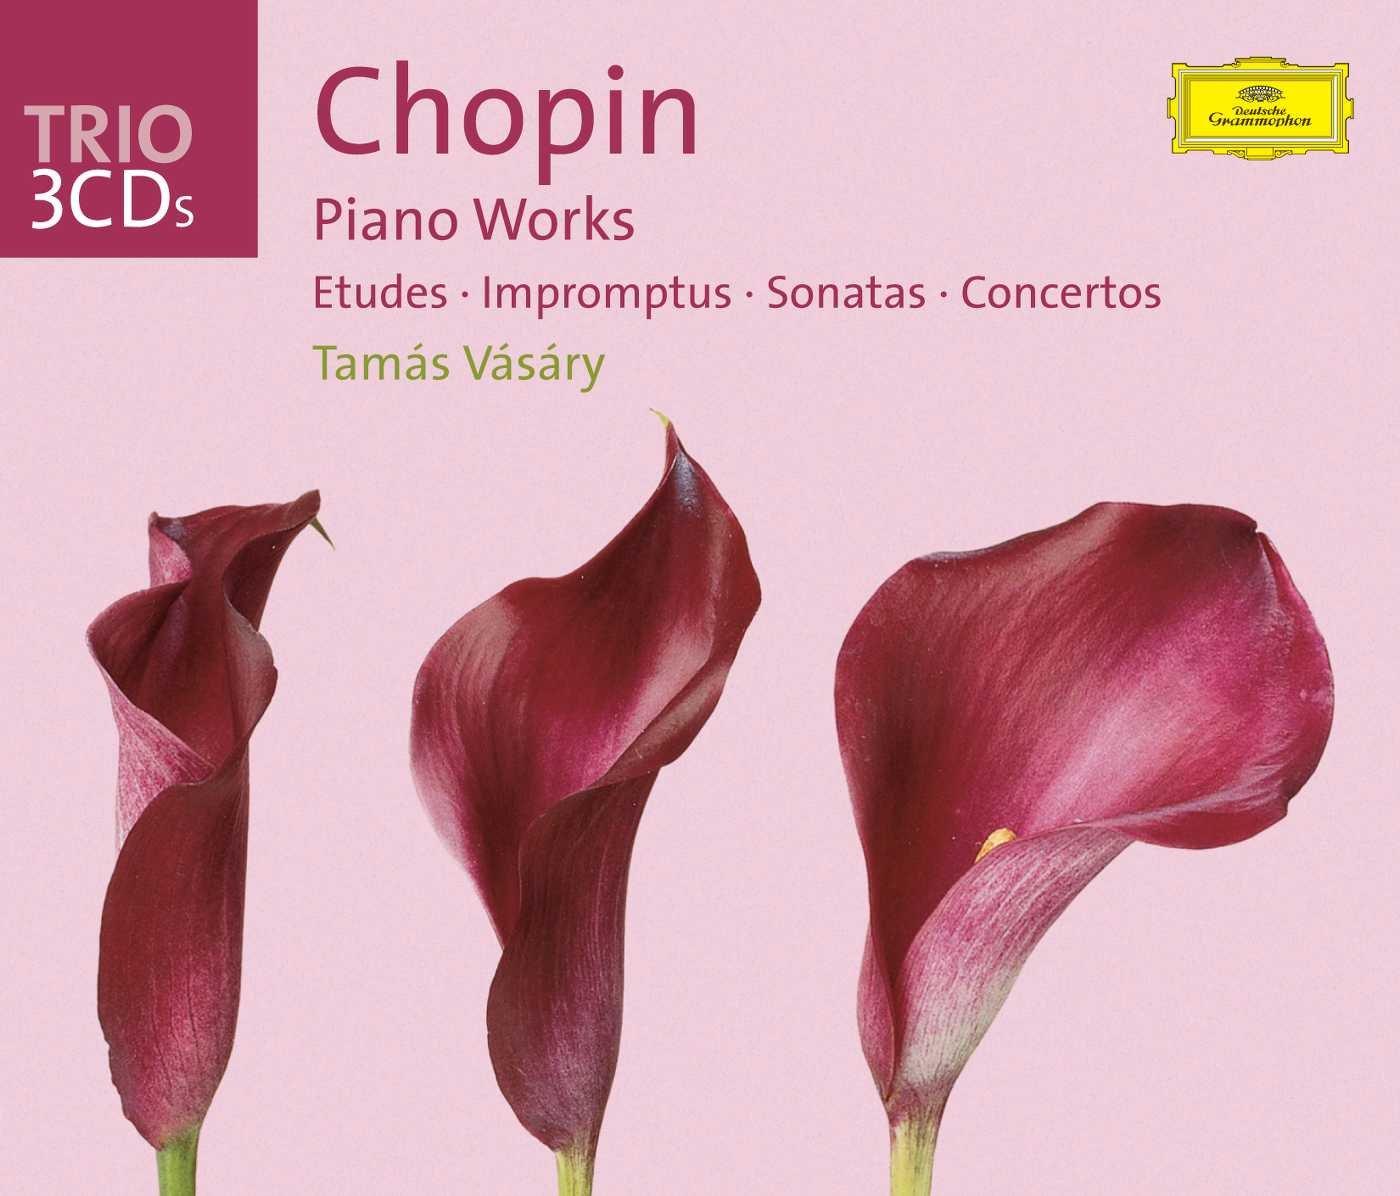 Chopin: Piano Works  [Etudes - Impromptus - Sonatas - Concertos - Mazurkas - Polonaise - Berceuse] by Deutsche Grammophon